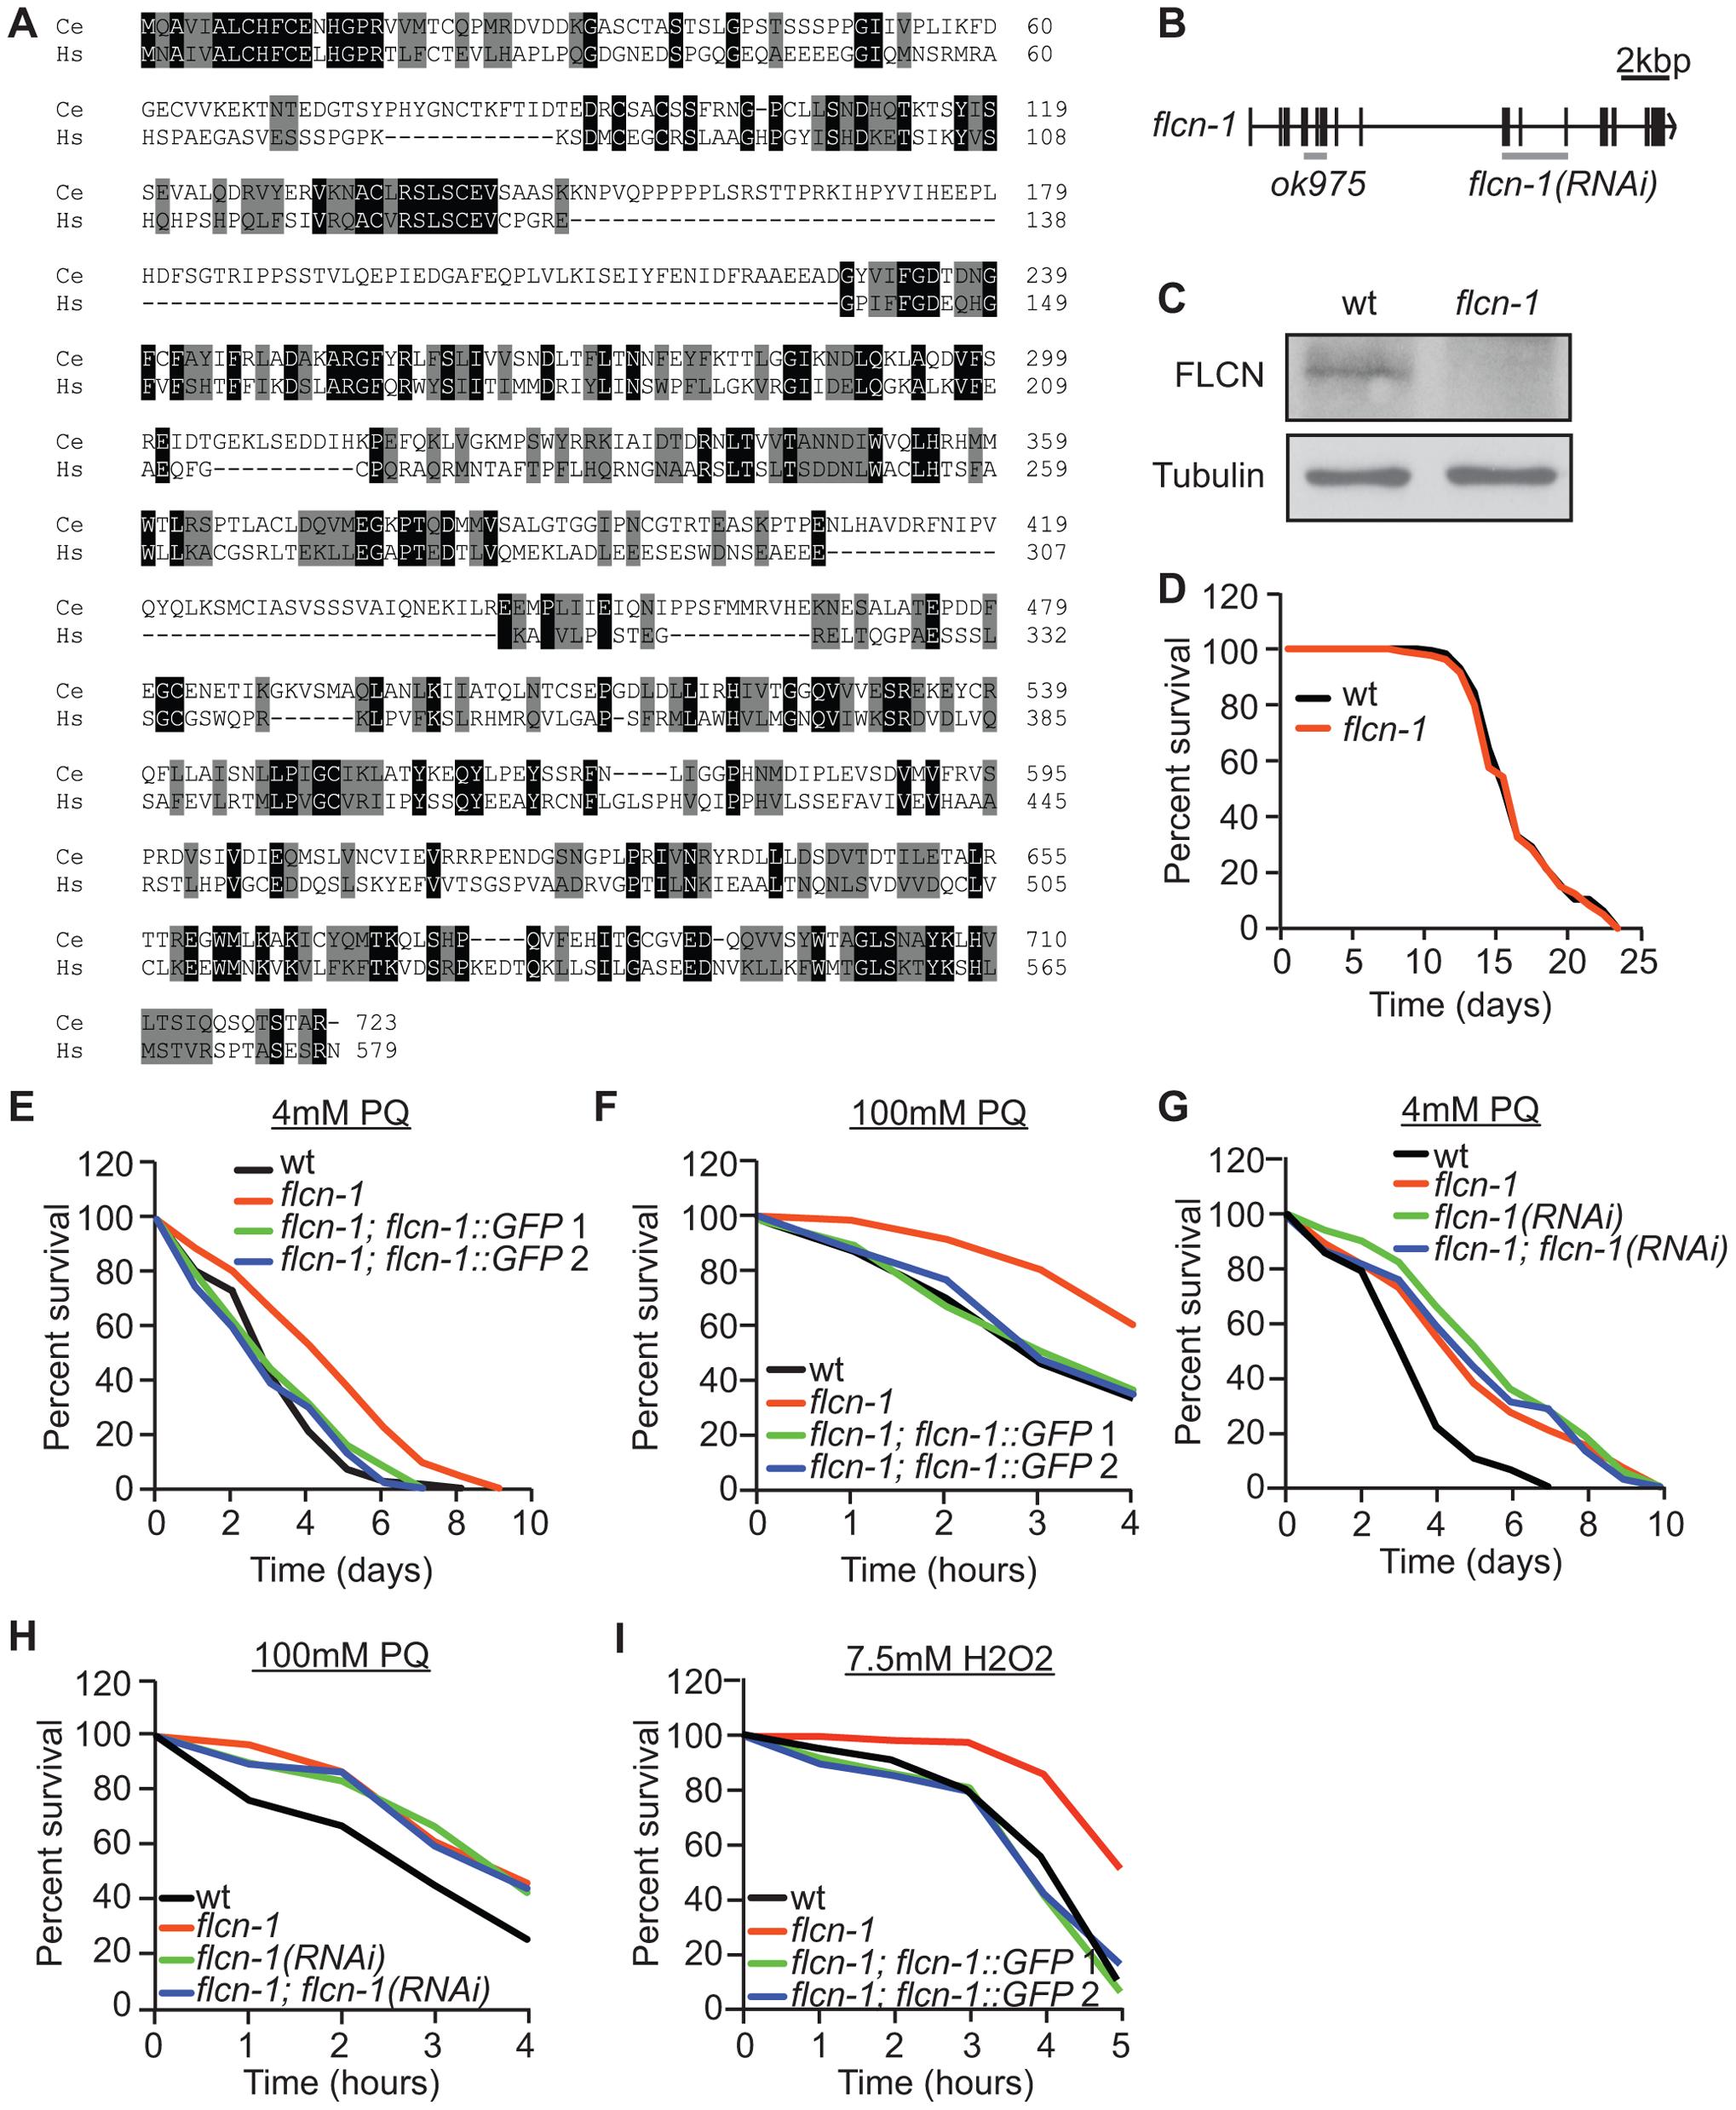 Loss of <i>flcn-1</i> confers resistance to oxidative stress in <i>C. elegans</i>.